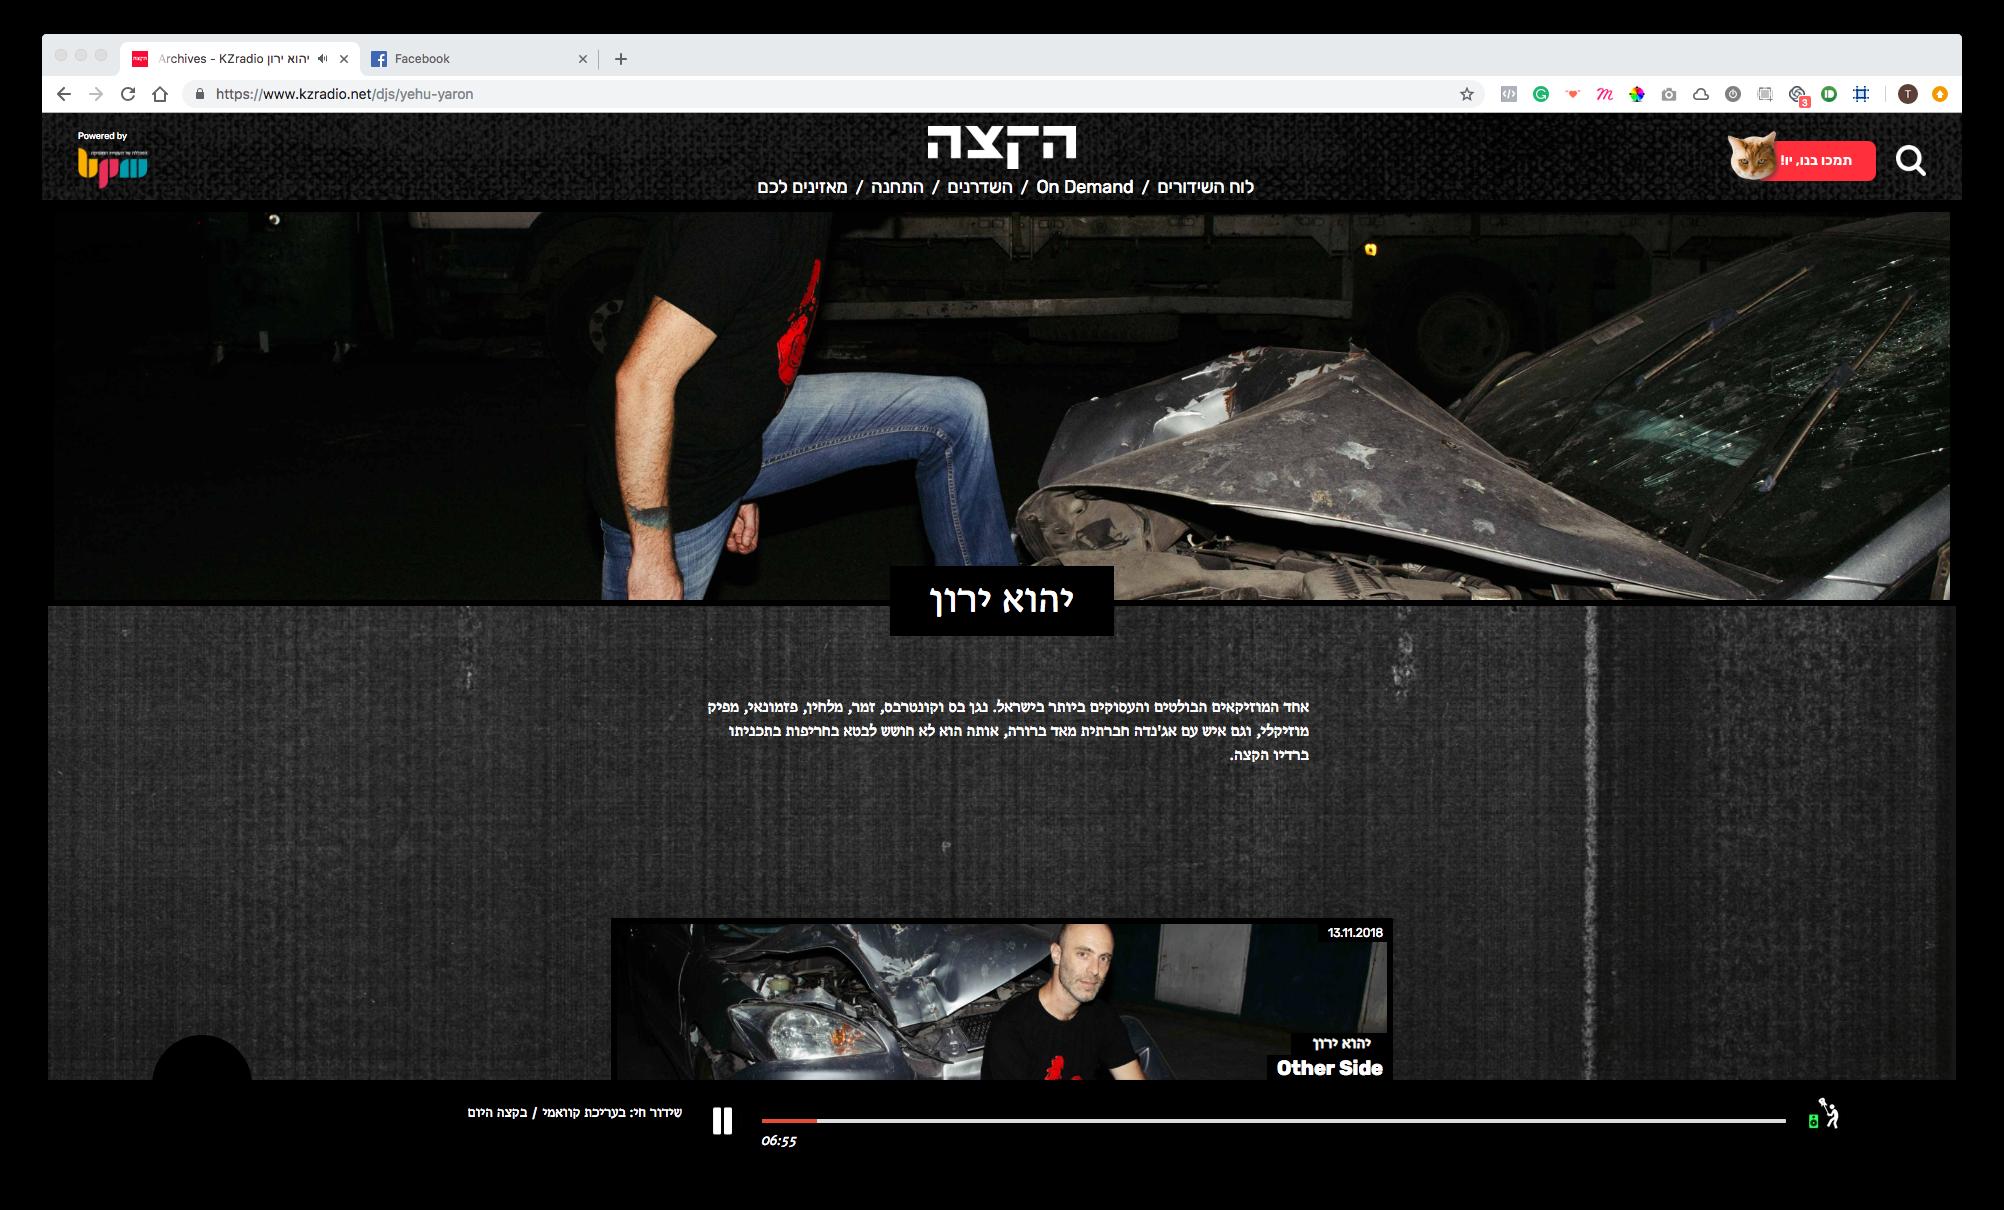 KZRadio_Broadcaster